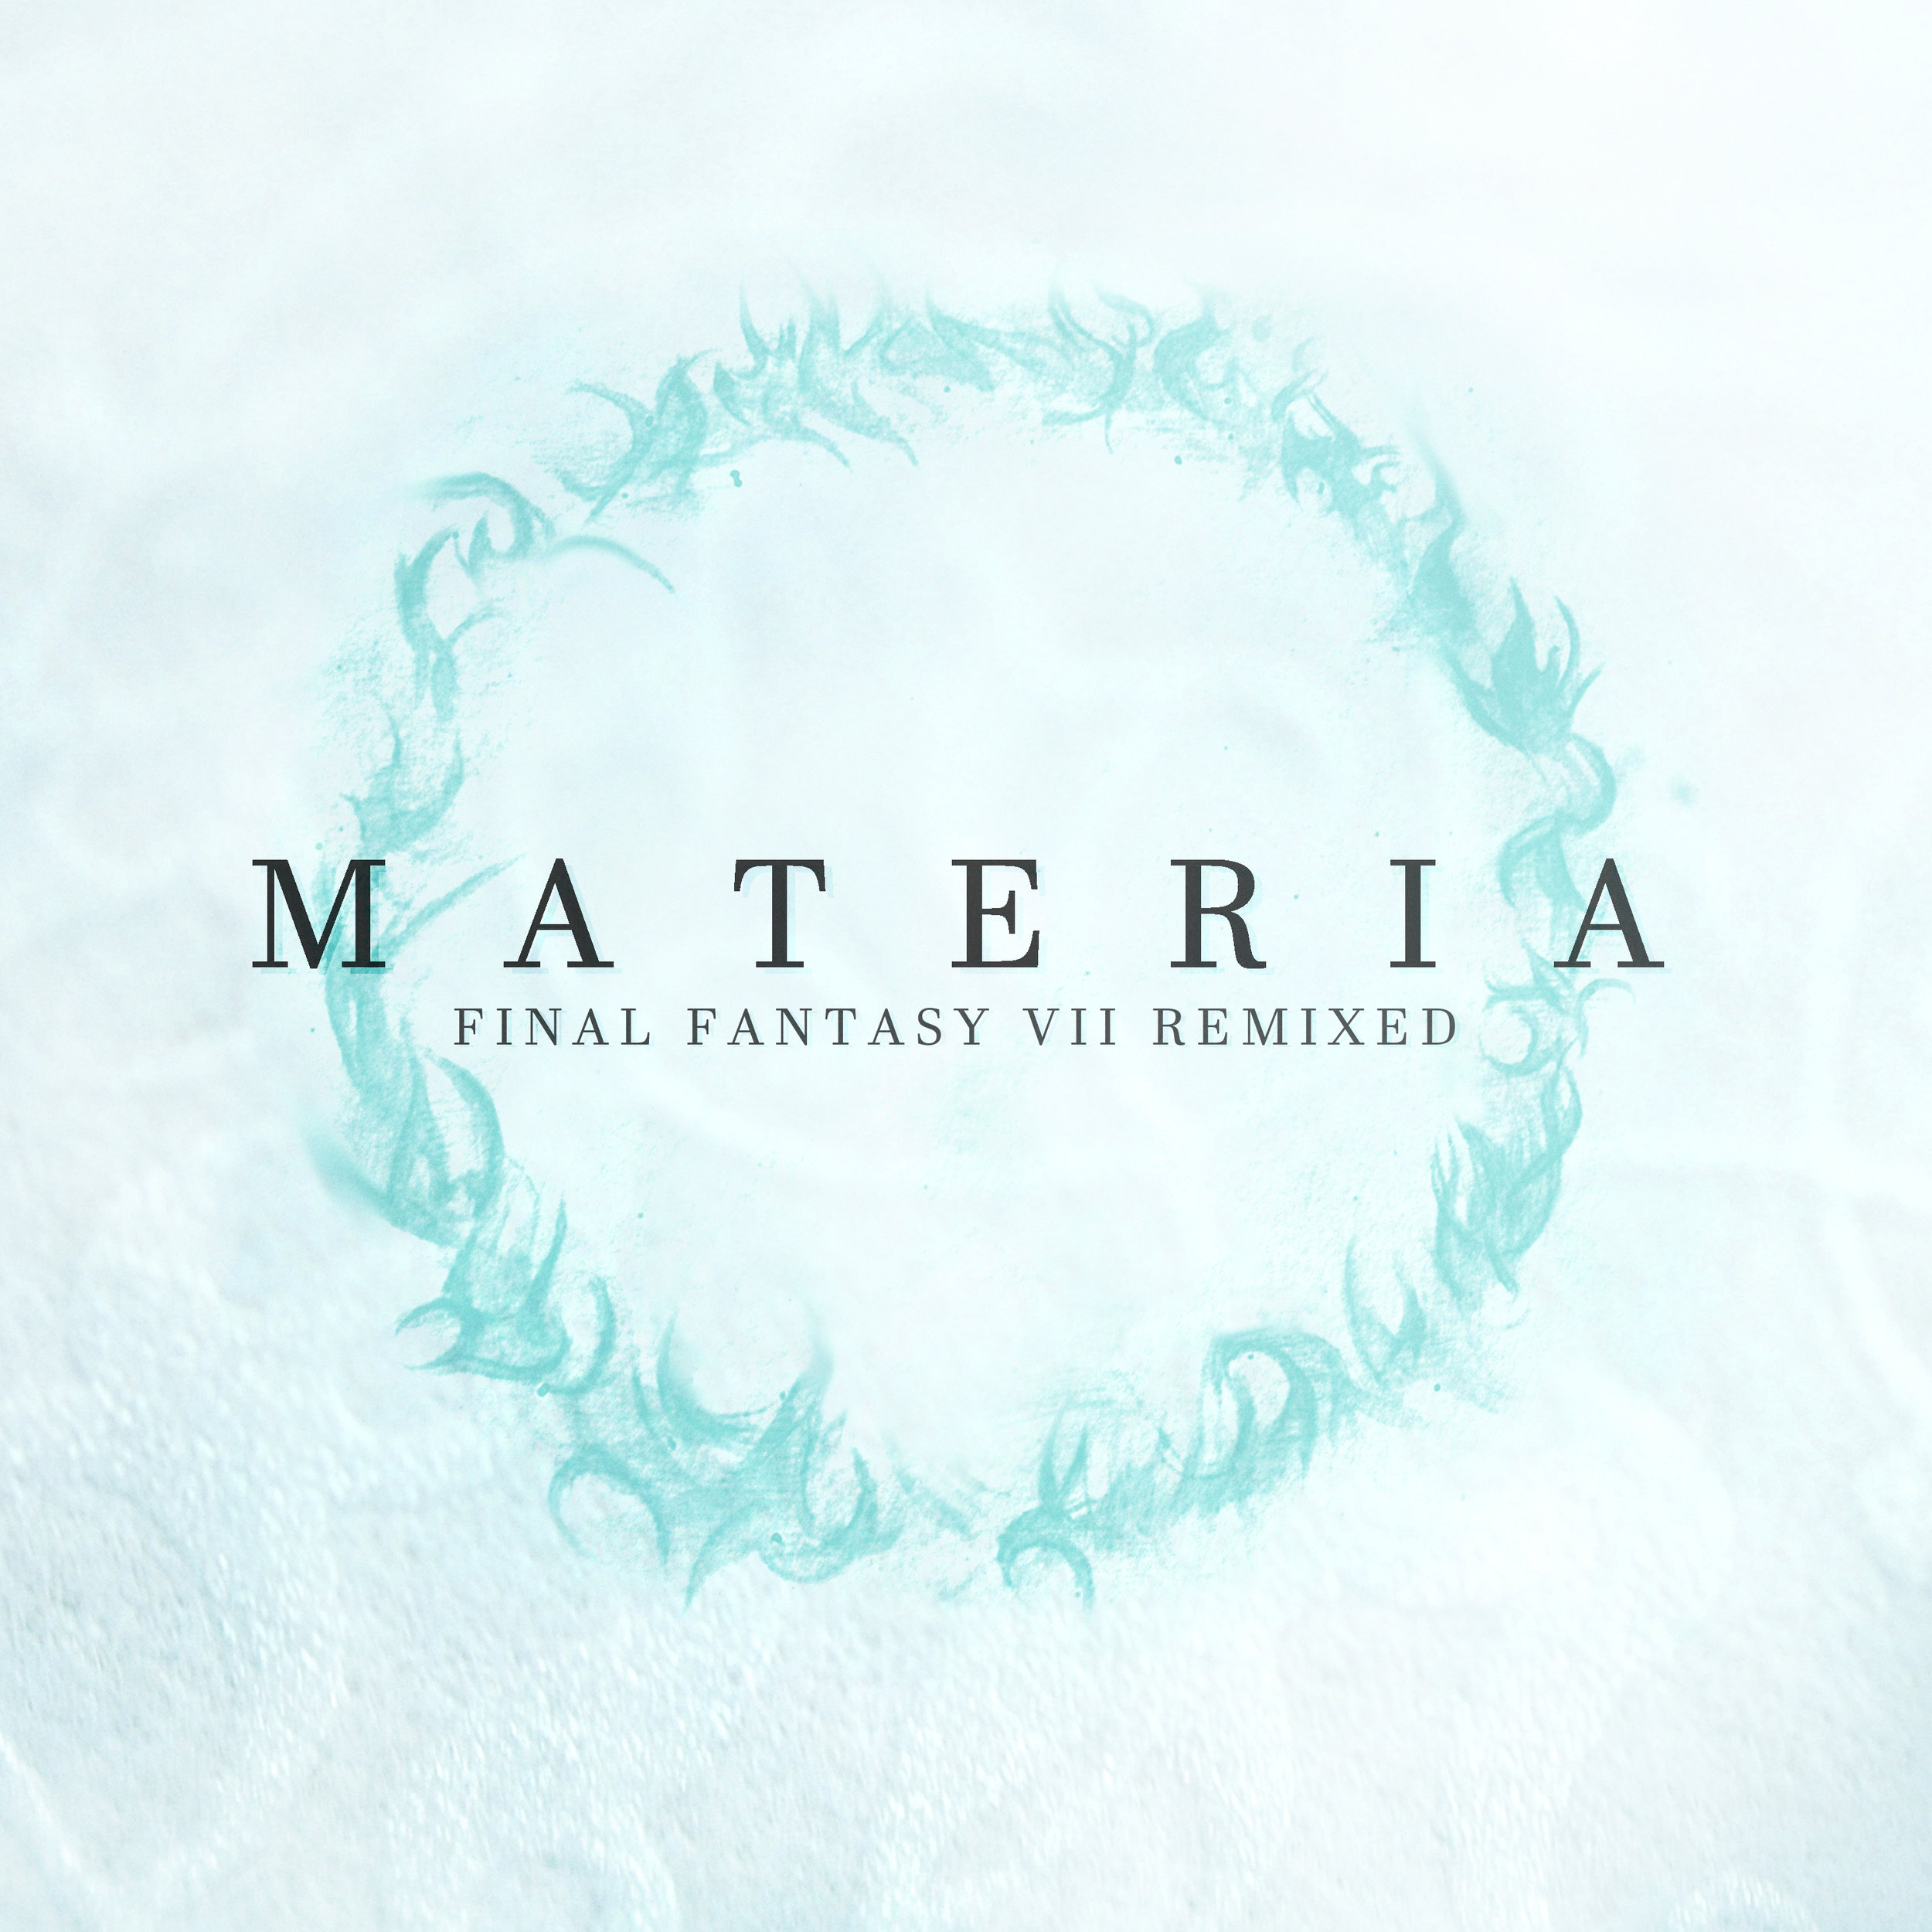 MATERIA: Final Fantasy VII Remixed    Disc 2  15.    Shinra Mansion    (arr.    David Peacock  )   Disc 3   6.    Mining Town    (arr.    David Peacock   )